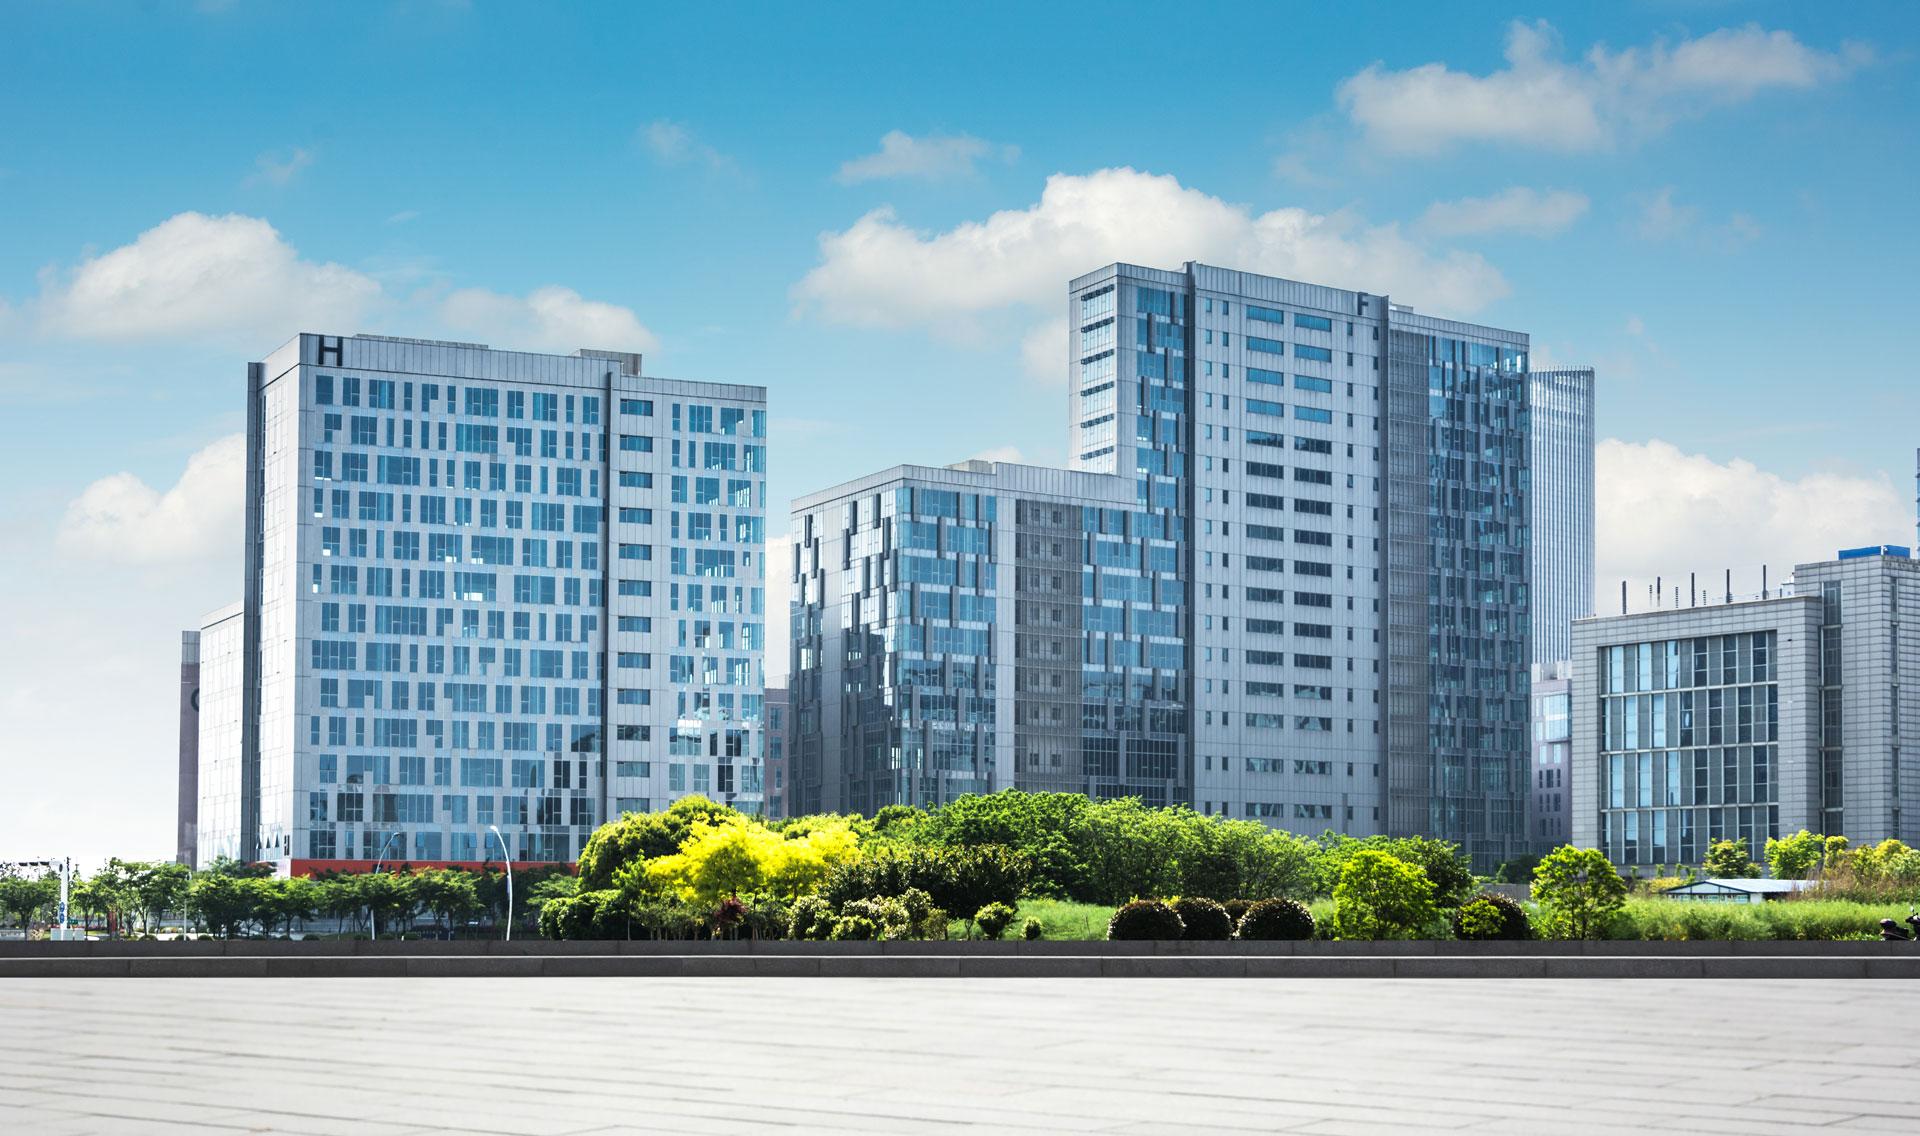 http://rohitsurilaw.com/wp-content/uploads/2017/07/Housing-Discrimination.jpg